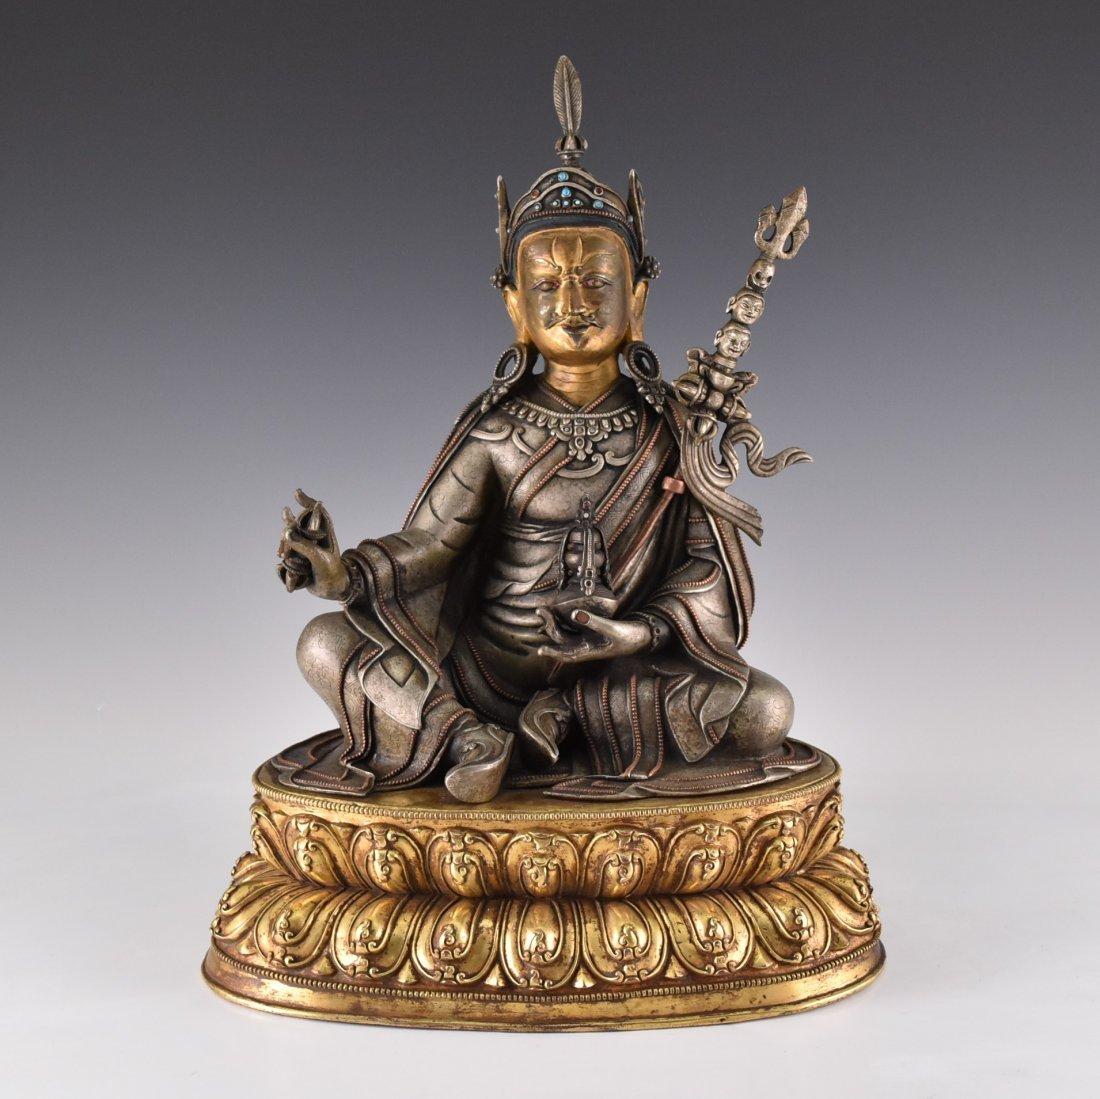 IMPORTANT, 17TH/18TH C. LARGE BRONZE SILVER GILT BUDDHA